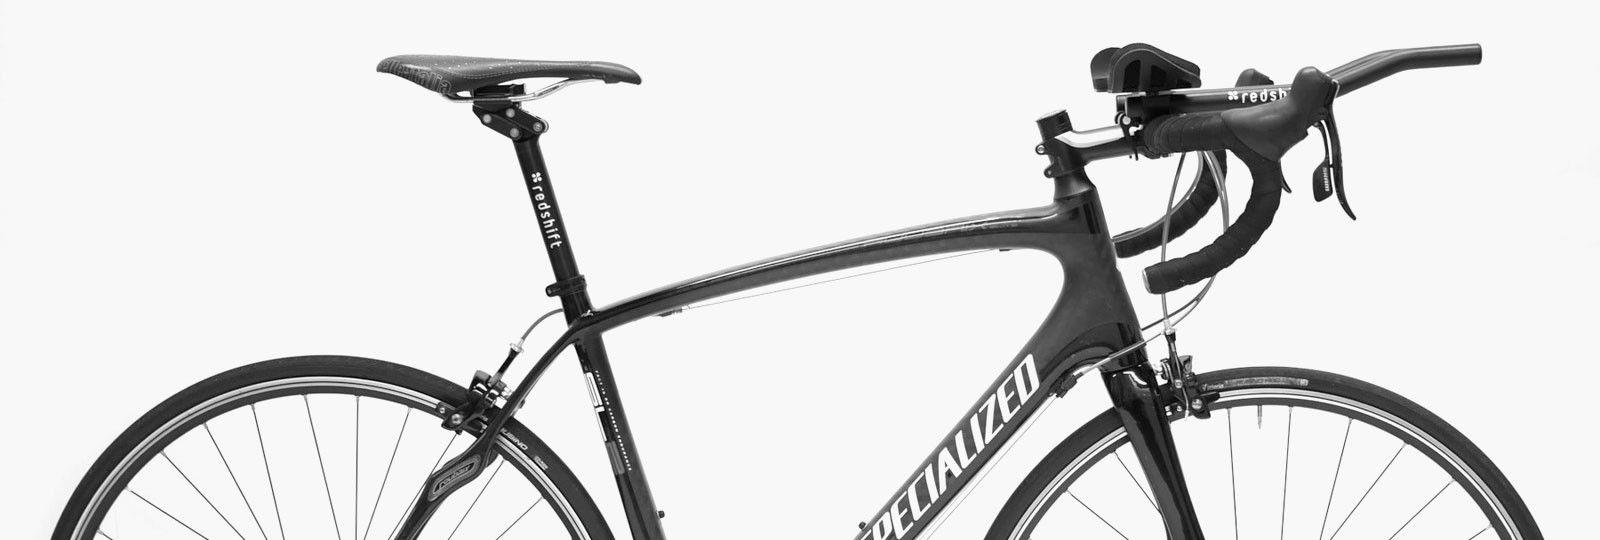 Redshift Switch Aero Bicycle Bike Sports